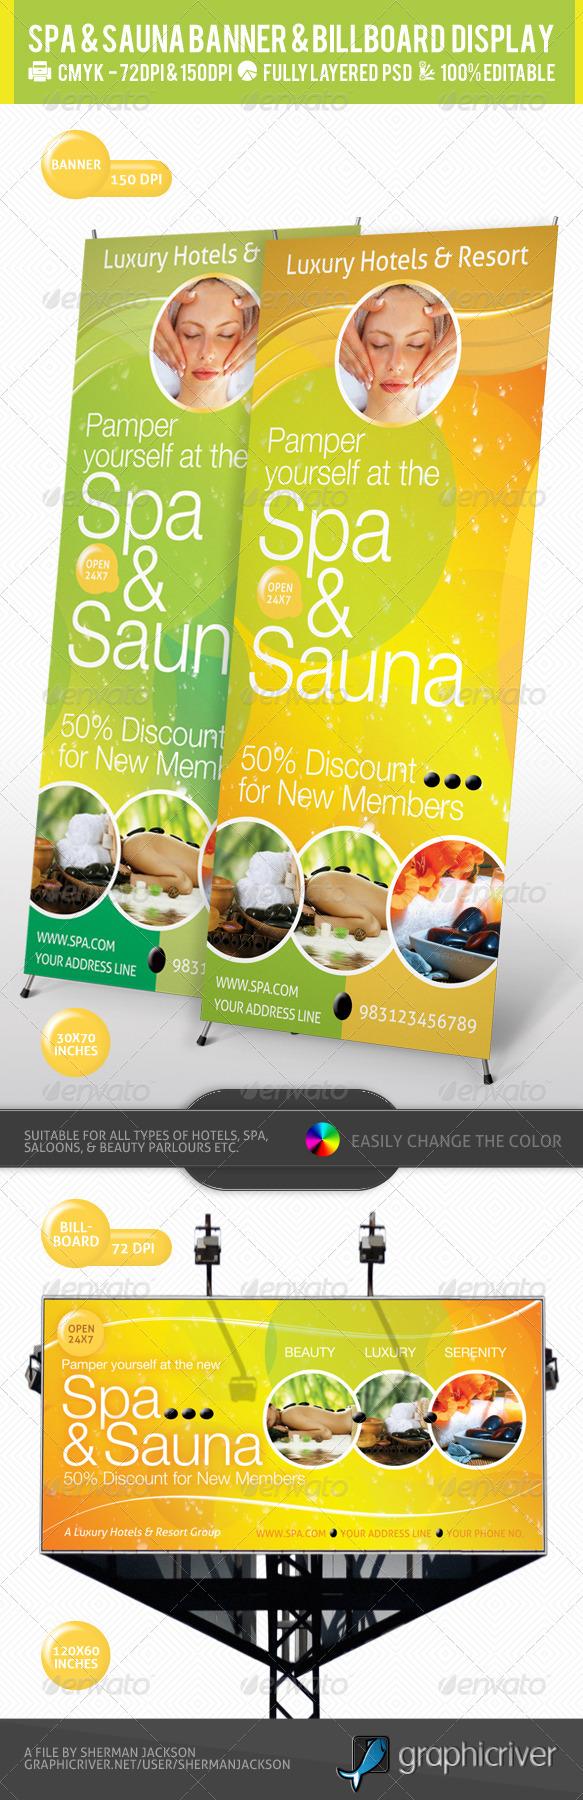 GraphicRiver Spa & Sauna Multipurpose Banner & Billboard PSD 2403323